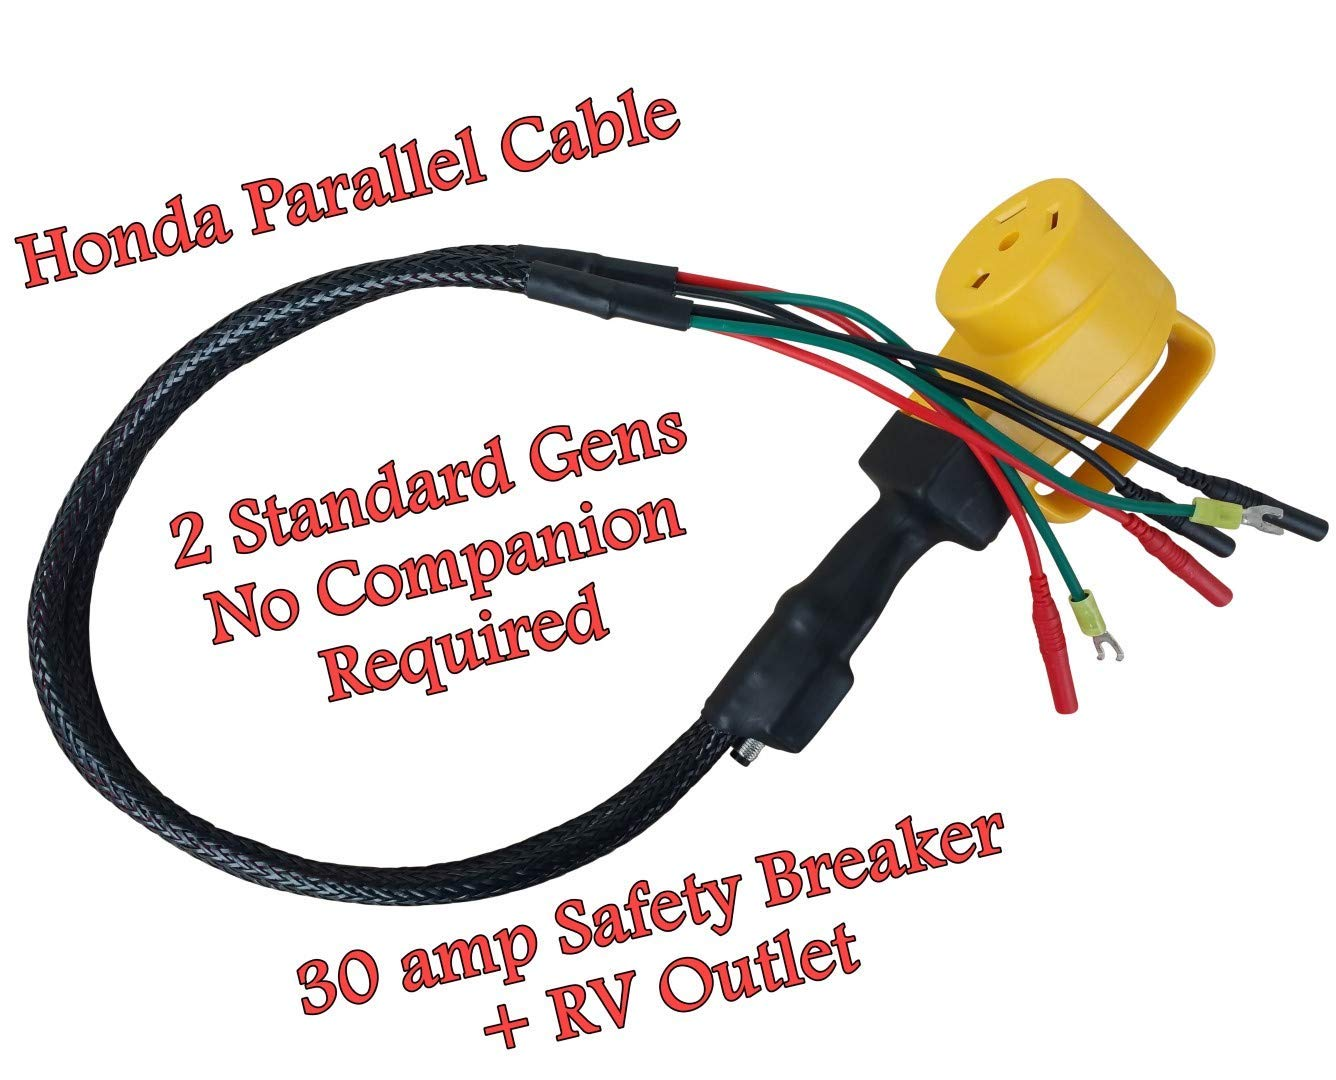 Hutch Mountain Parallel Any 2 Eu2200i / EU2000i Honda Genertor - no Companion Needed - Cable by Hutch Mountain